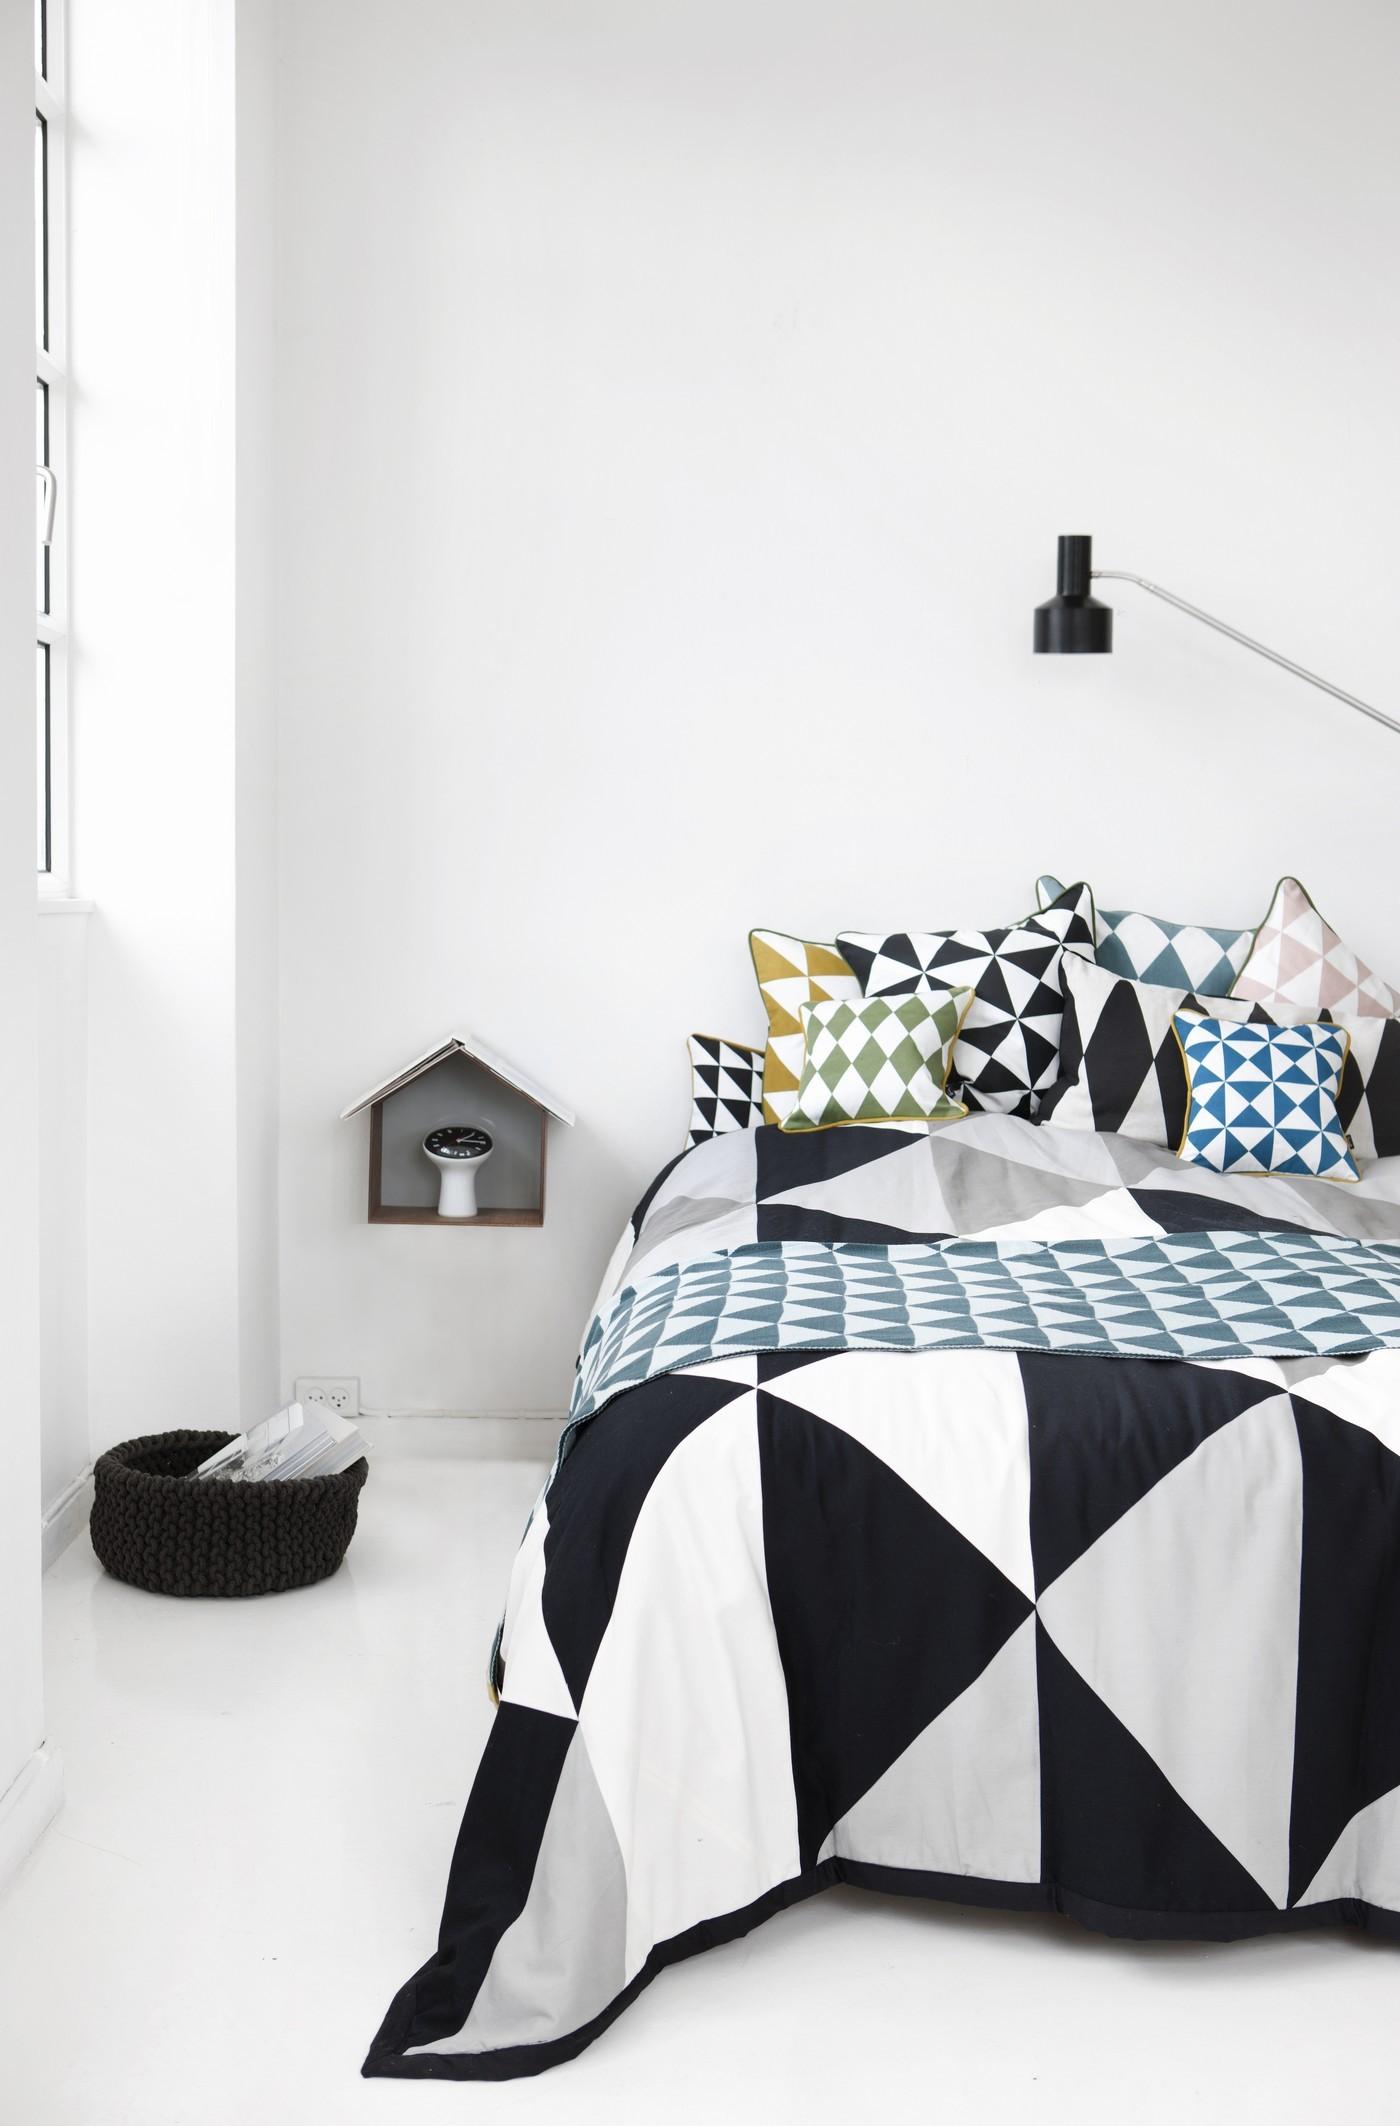 Ferm Living's Geometry cushions, Cloudberry Living